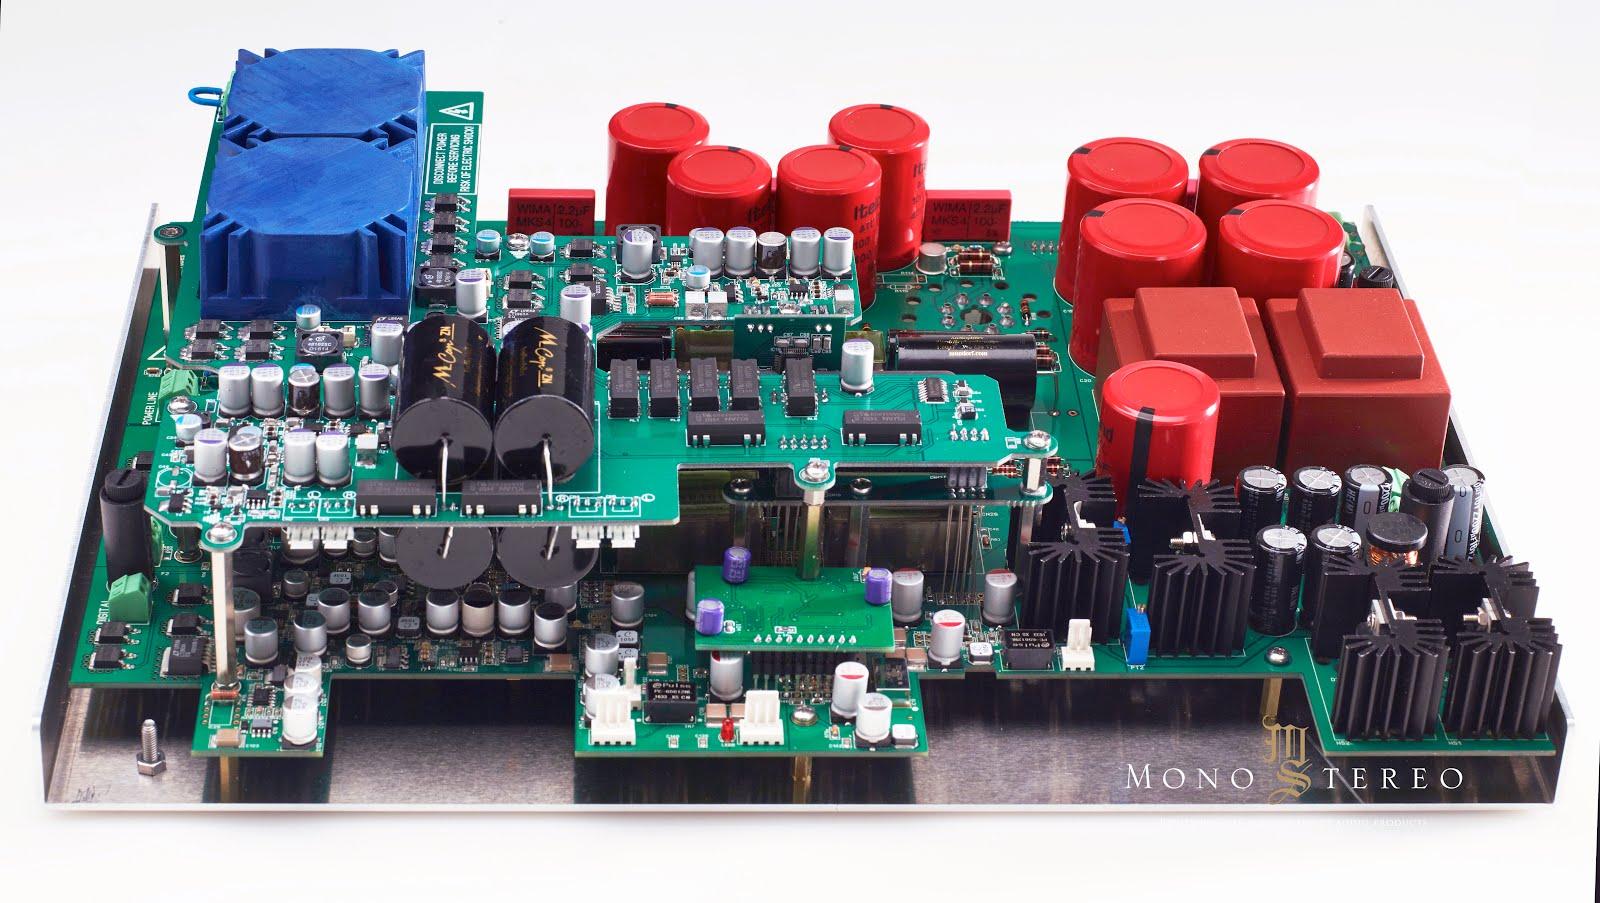 Mono And Stereo High End Audio Magazine Canever Zerouno Plus Dac To Circuit